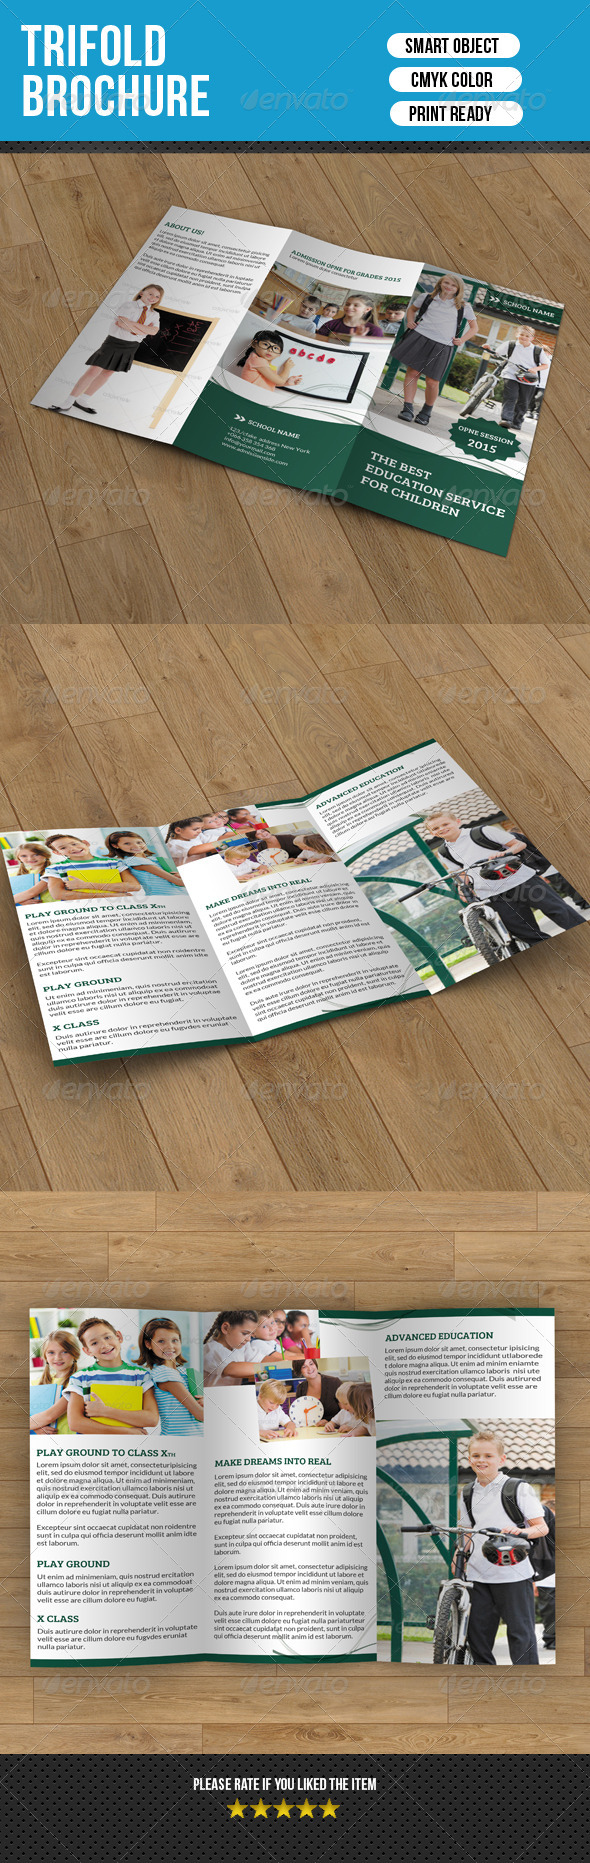 GraphicRiver Kids School Trifold Brochure-V05 7778809